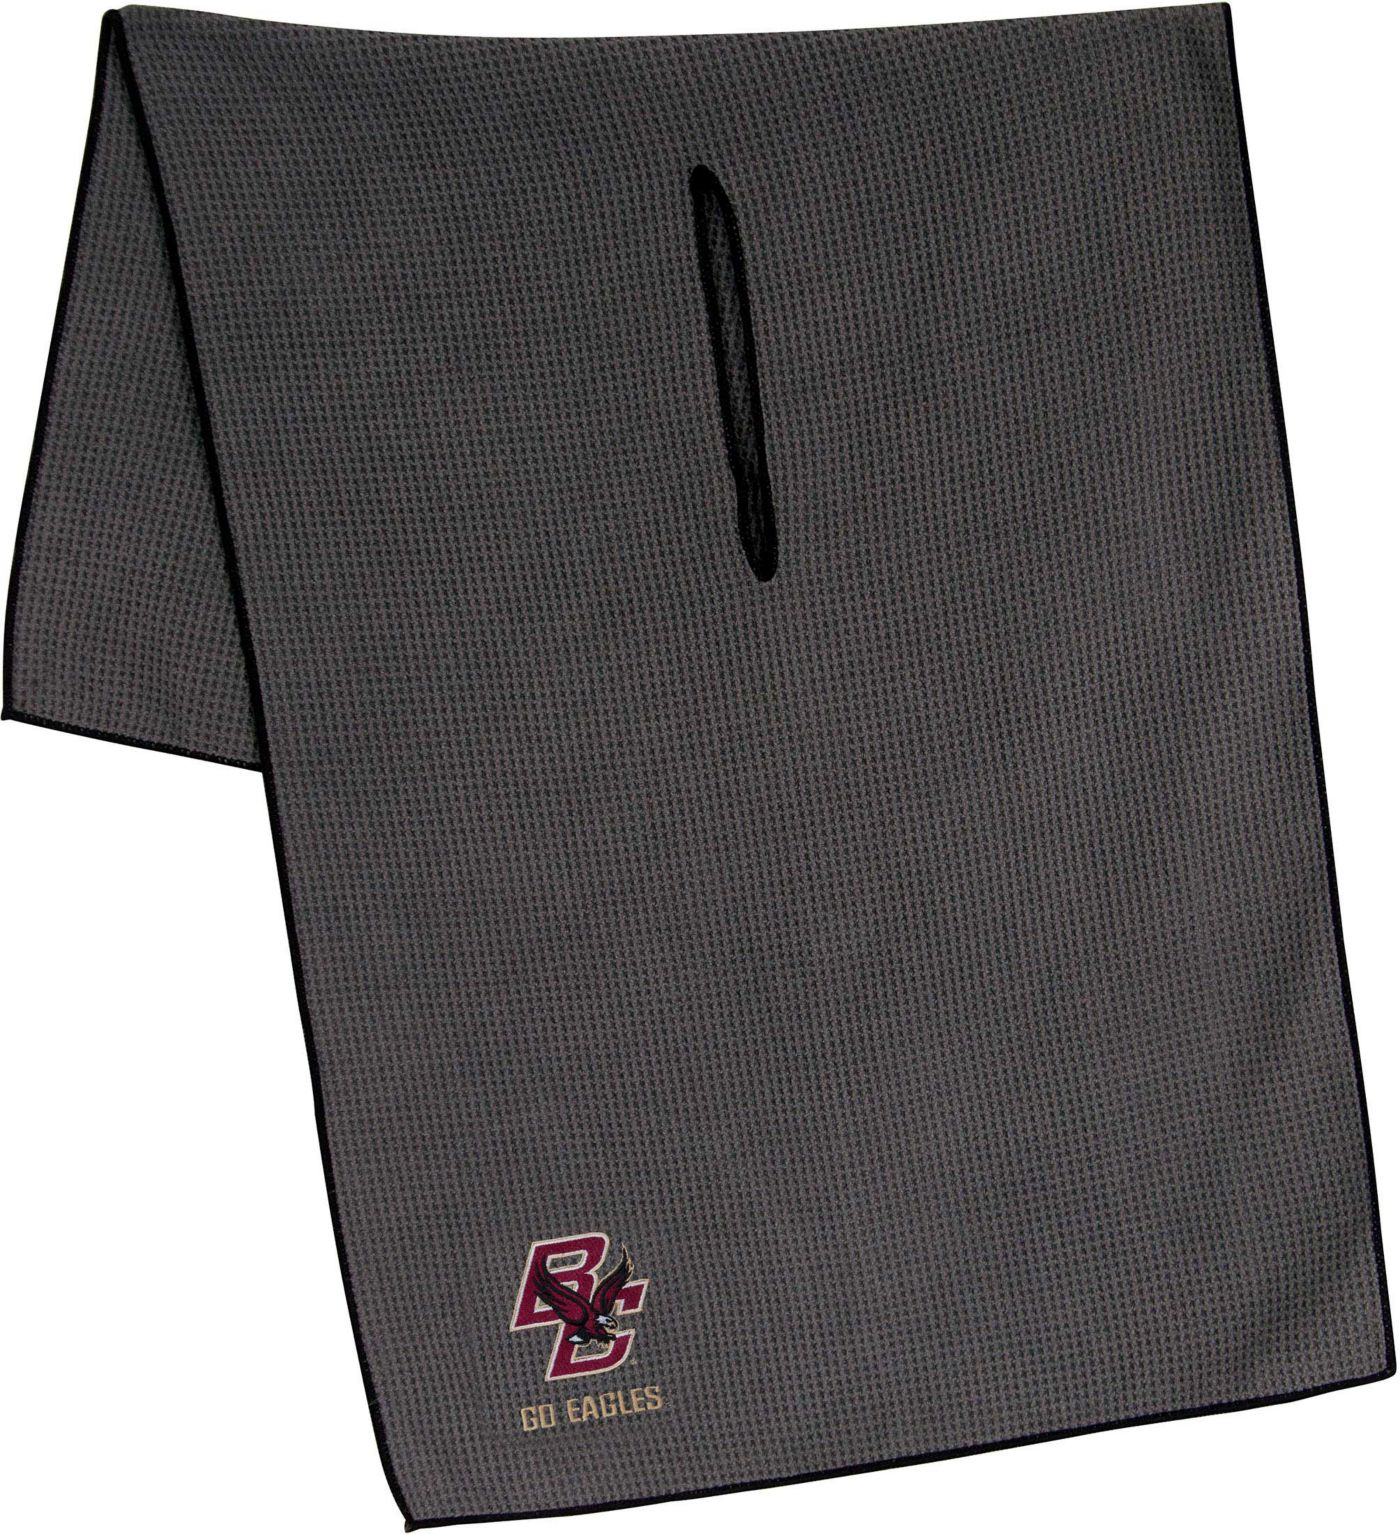 "Team Effort Boston College Eagles 19"" x 41"" Microfiber Golf Towel"